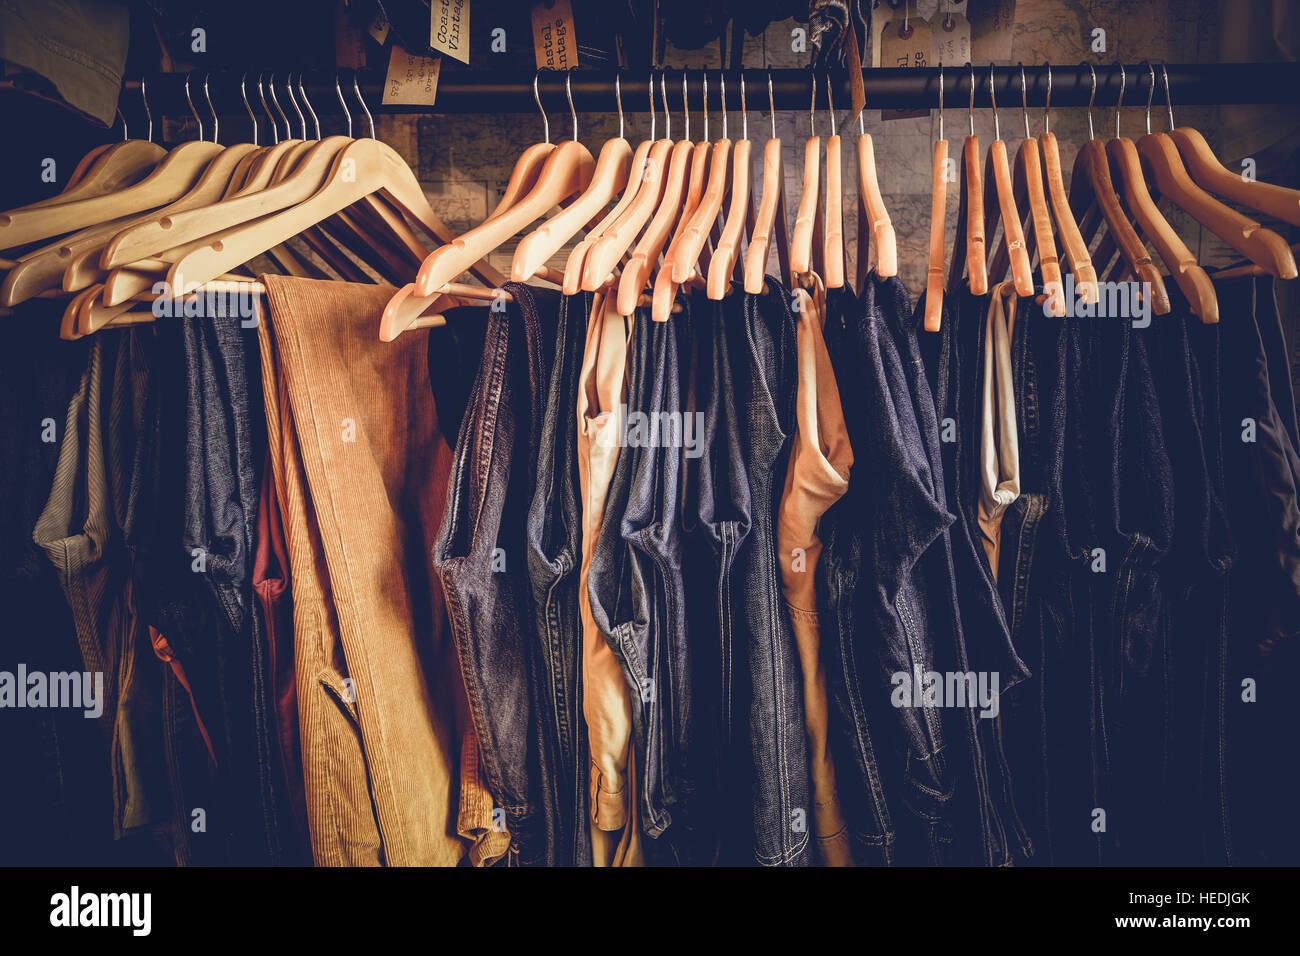 Old denim jeans on sale at Coastal Vintage, retro and vintage clothes shop, Aberystwyth UK - Stock Image